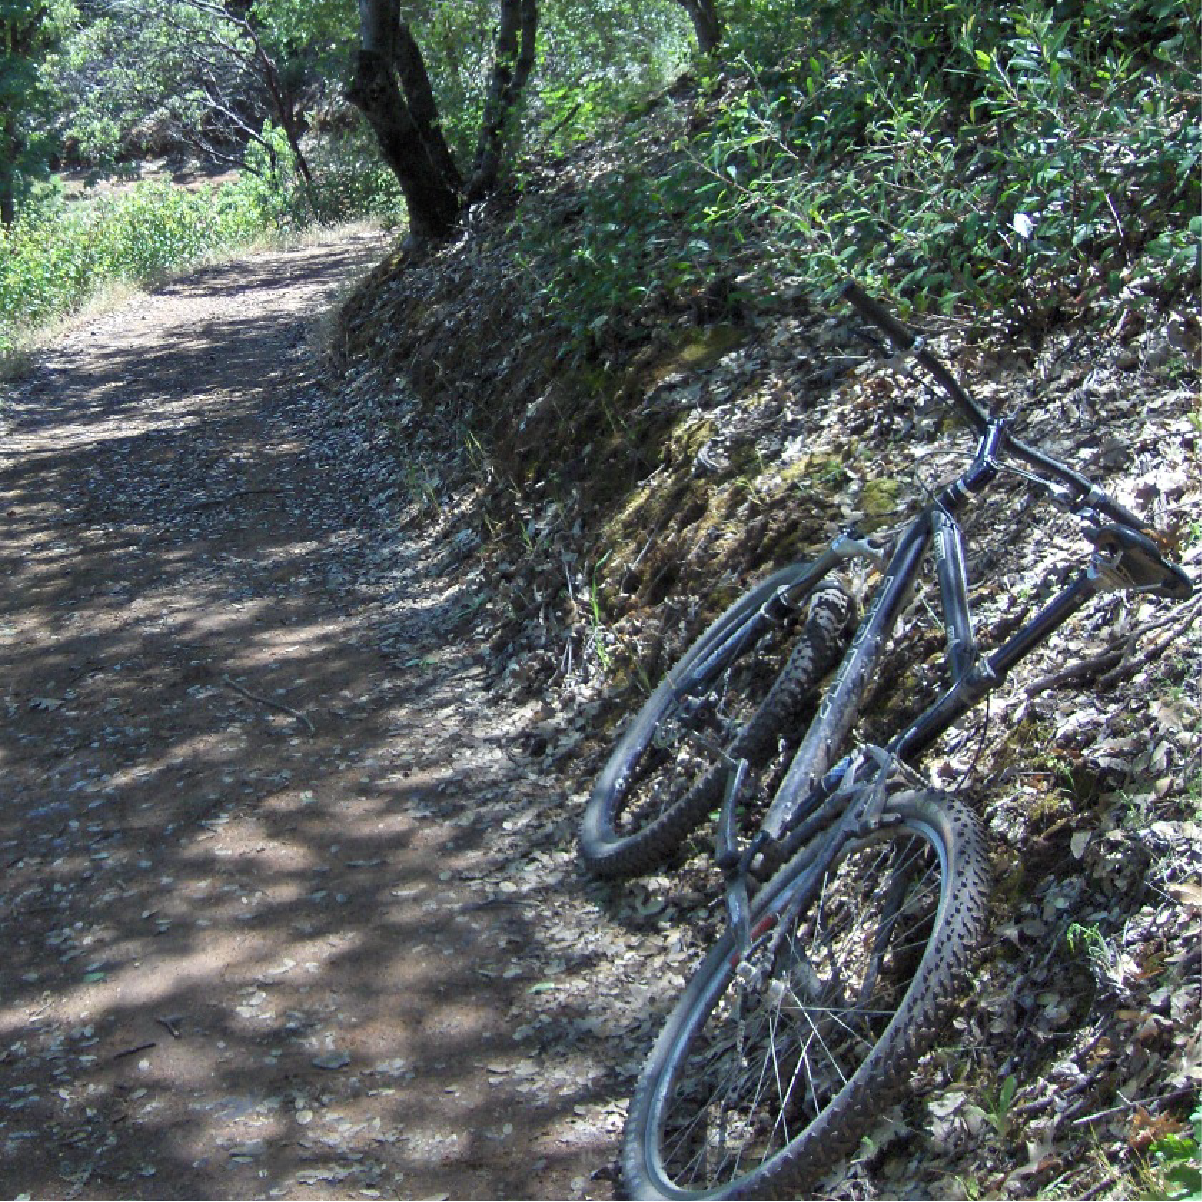 BICYCLIST -